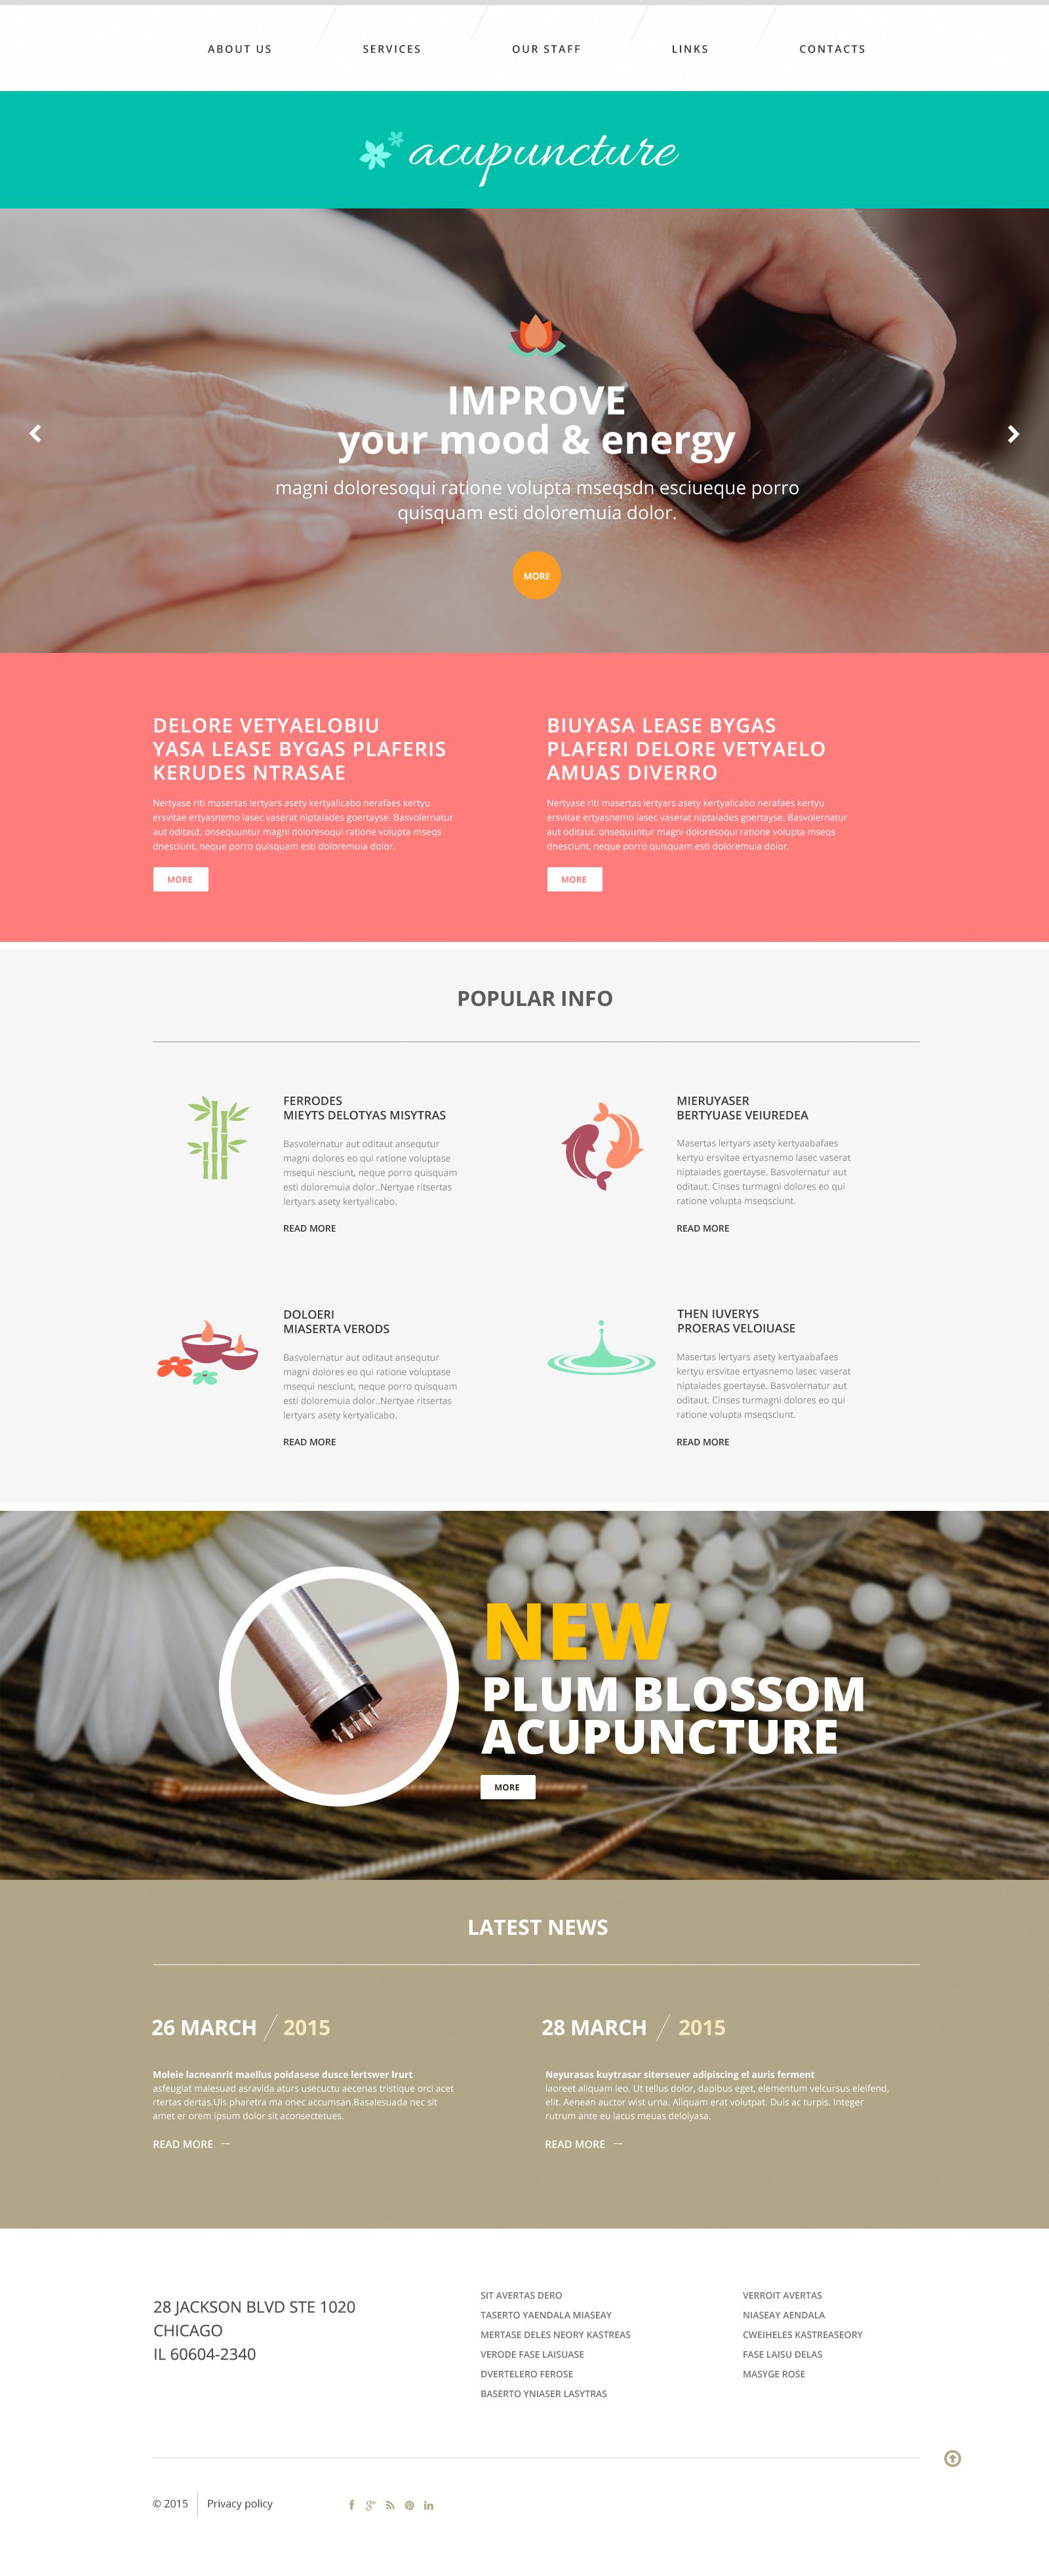 Acupuncture Clinic Website Template #52876